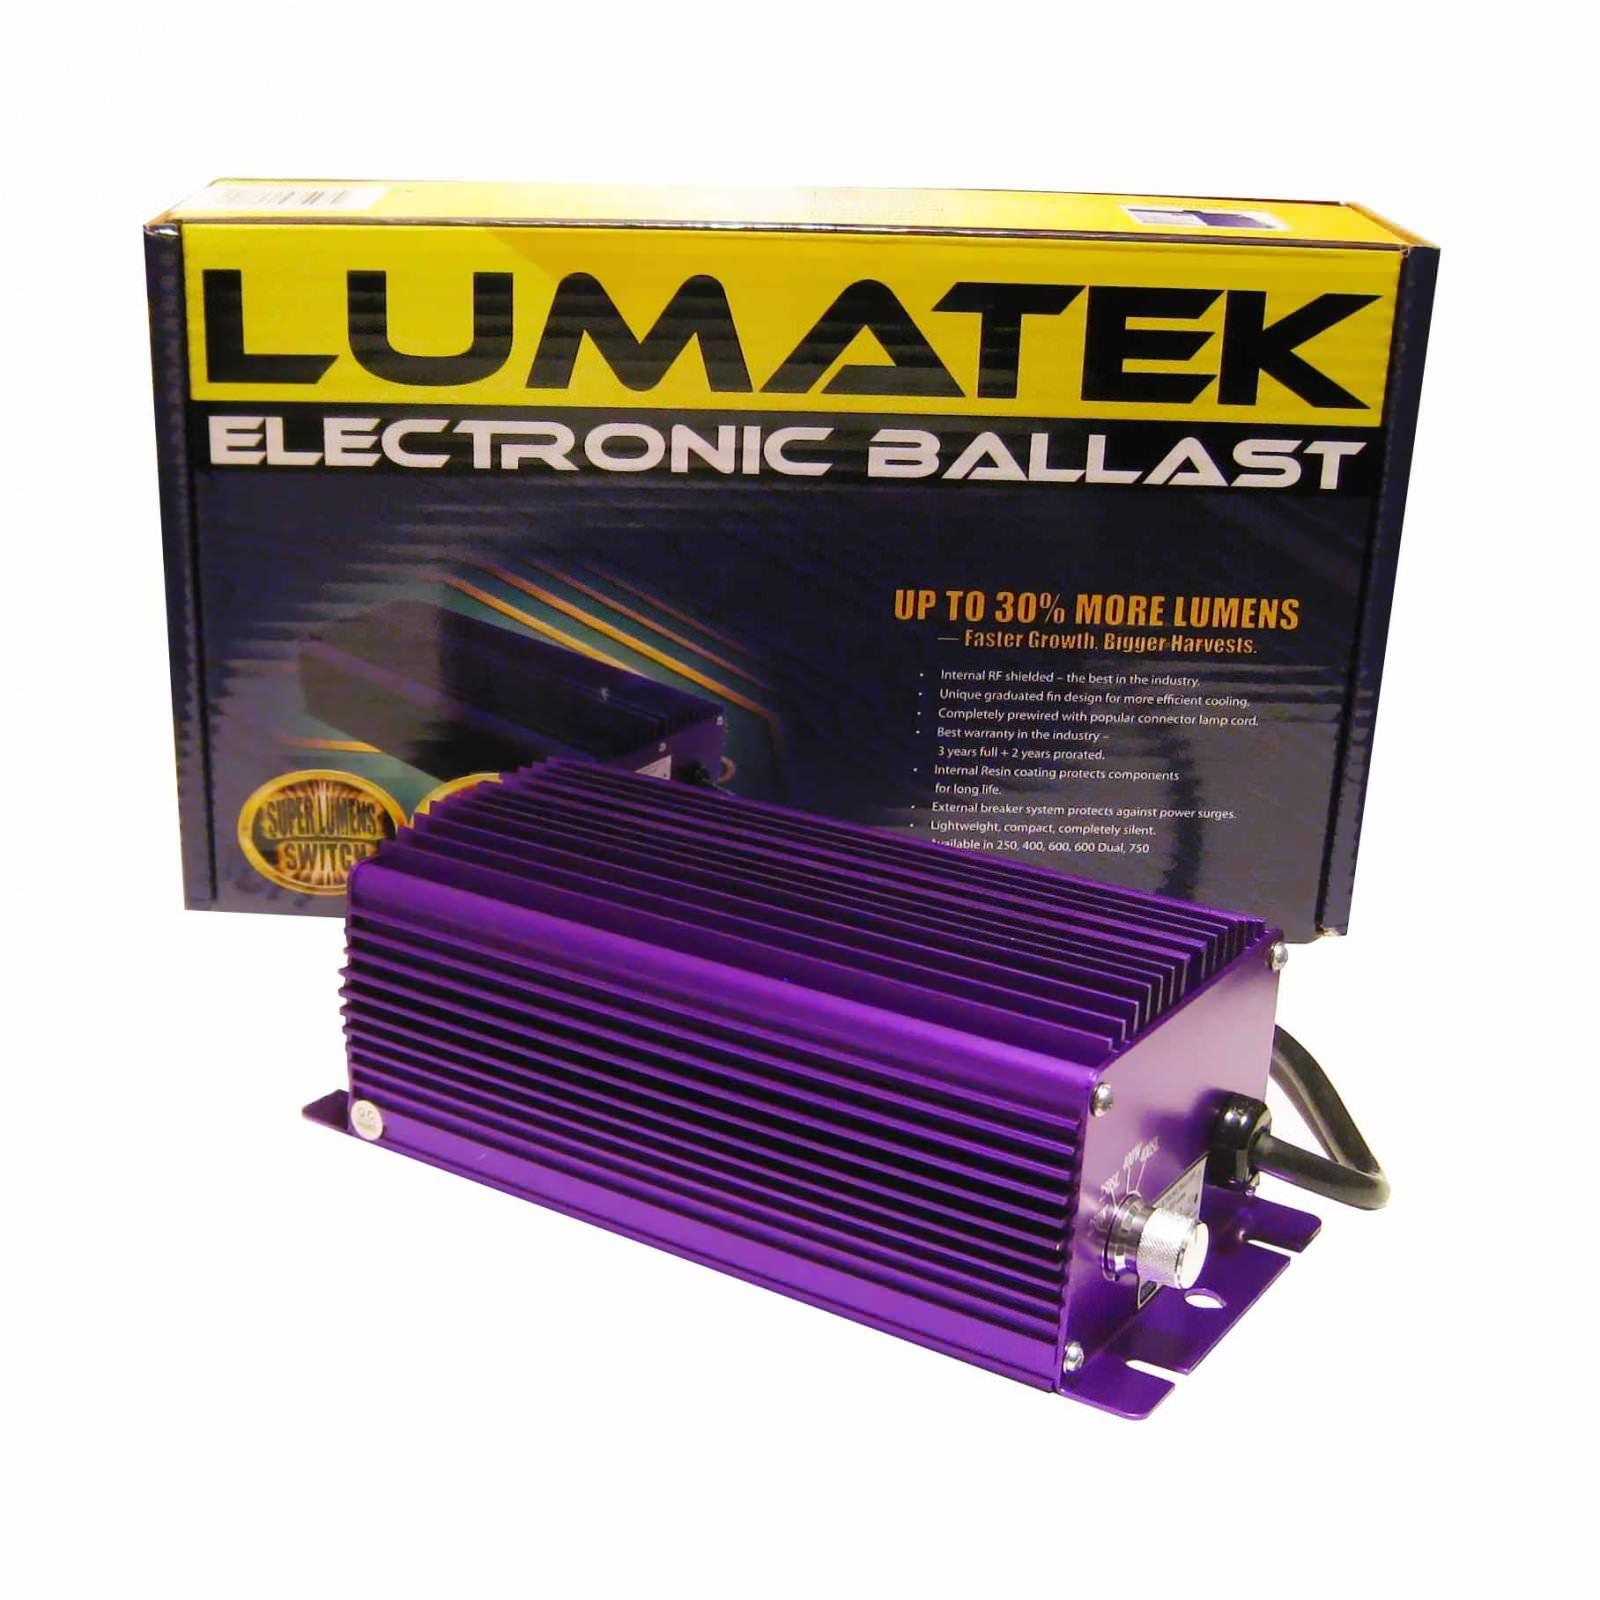 Lumatek Digital Ballast 400w Dimmer - Eclairage Lampes Ballast ...